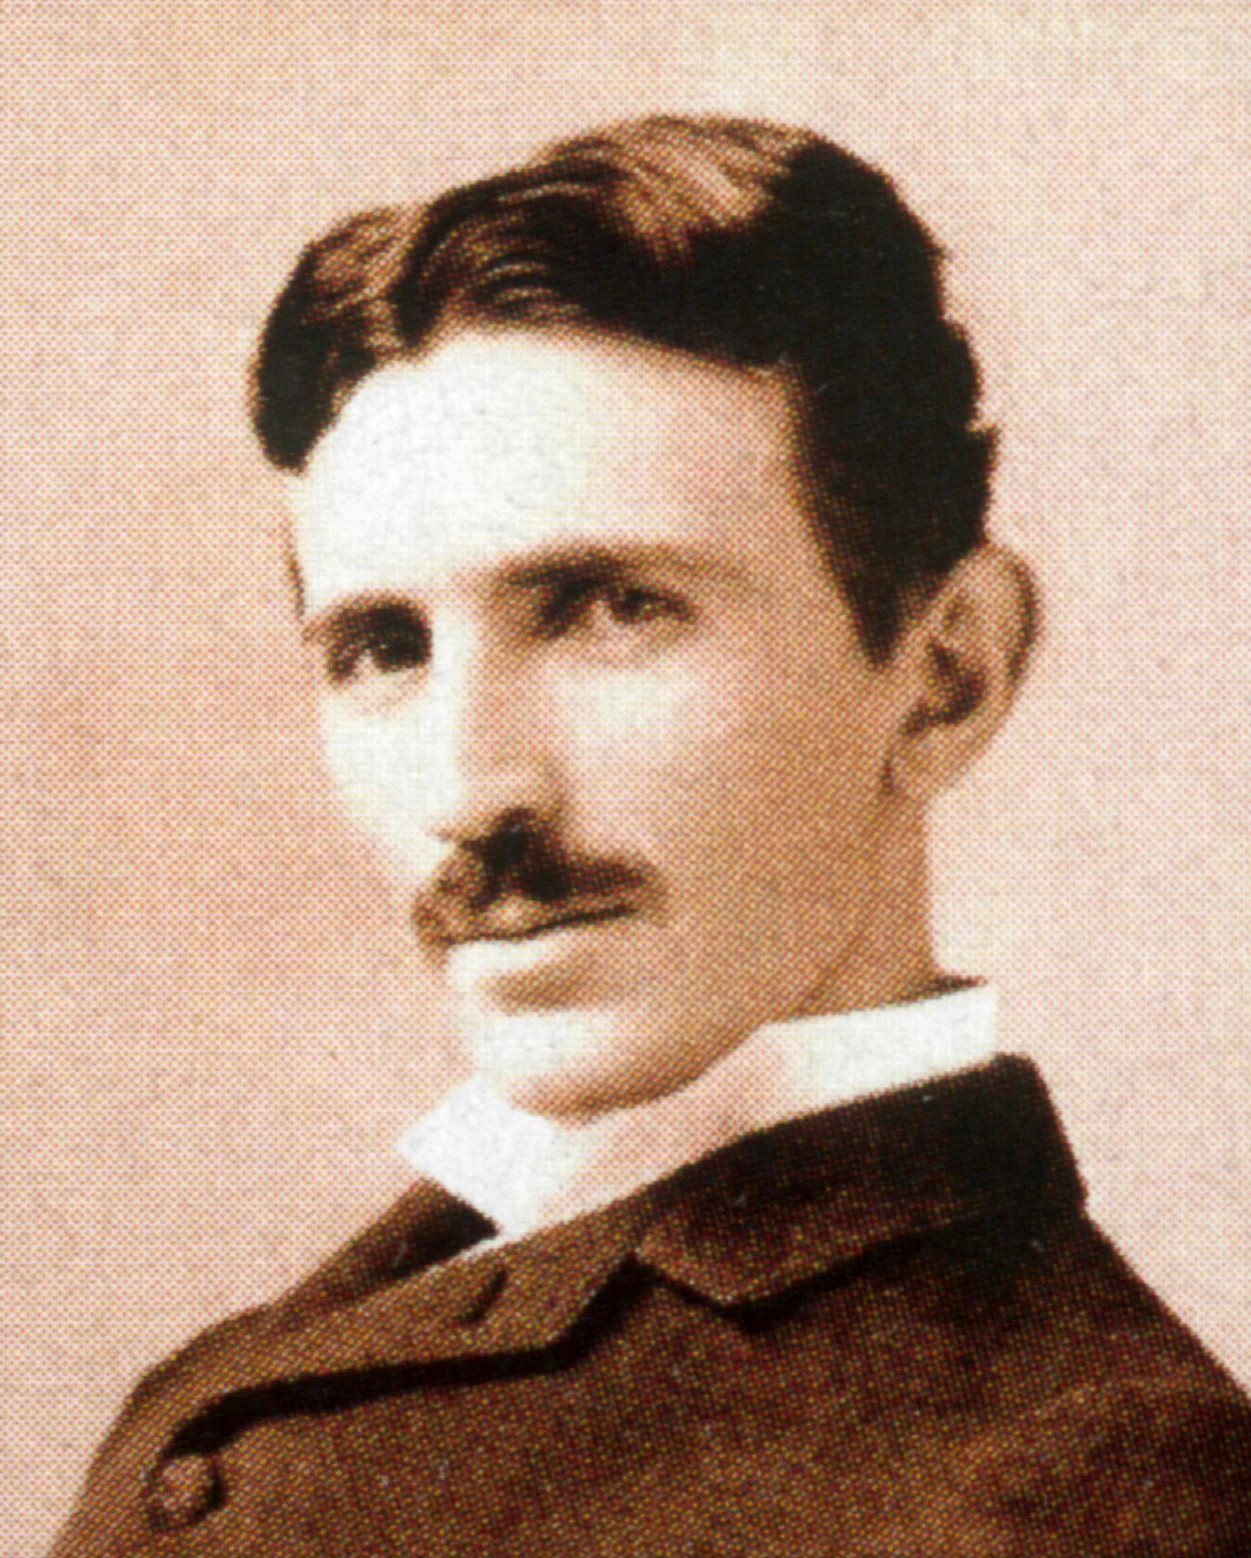 Nikola Tesla circa 1890